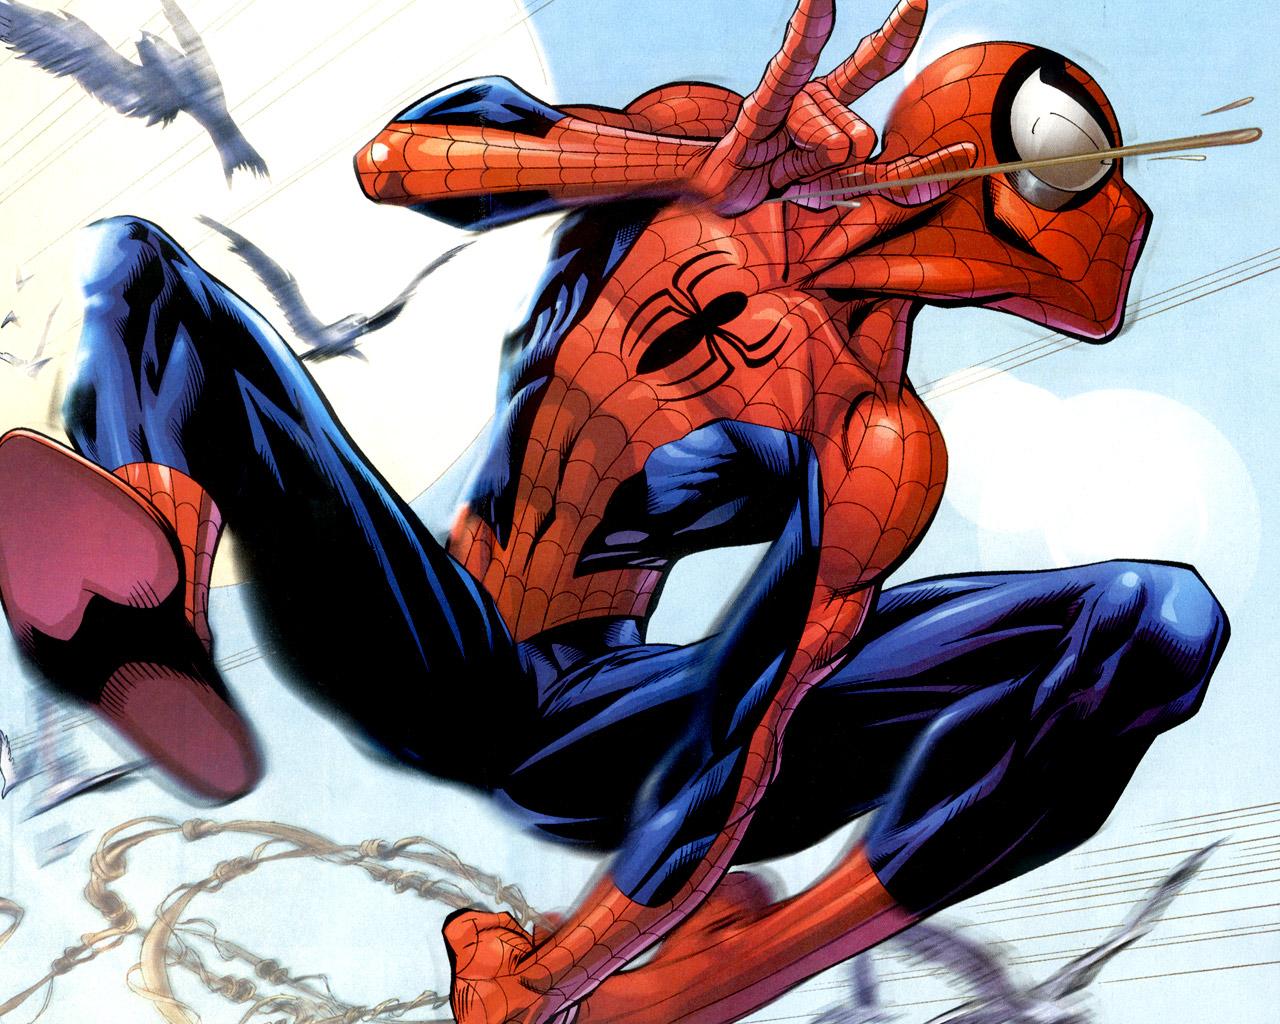 el hombre araña 4 ¿aceptable o otra basura hollywoodense? - Taringa!